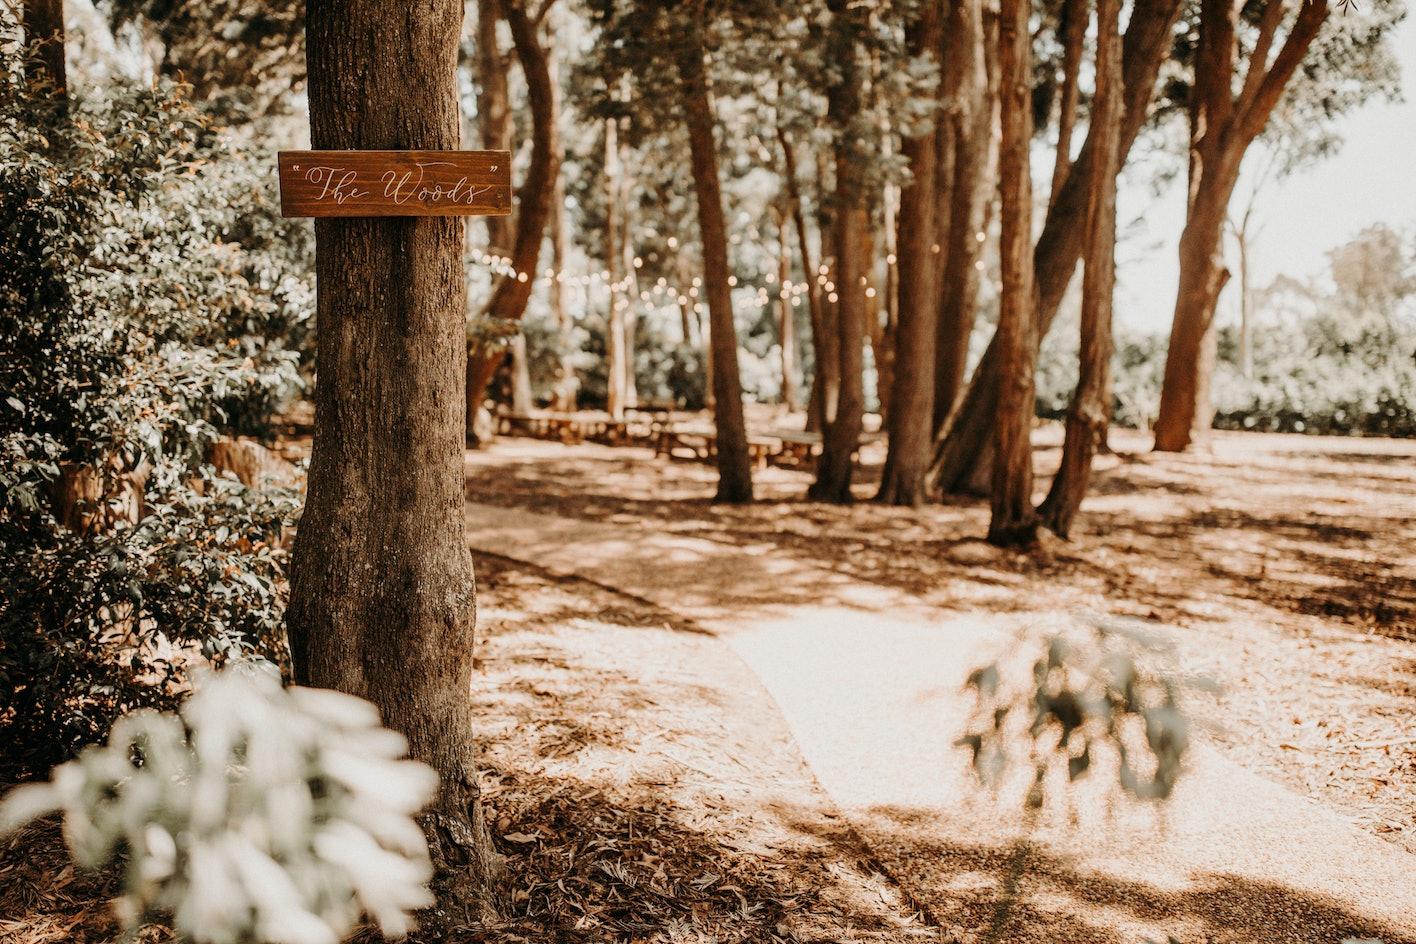 The Woods ceremony location